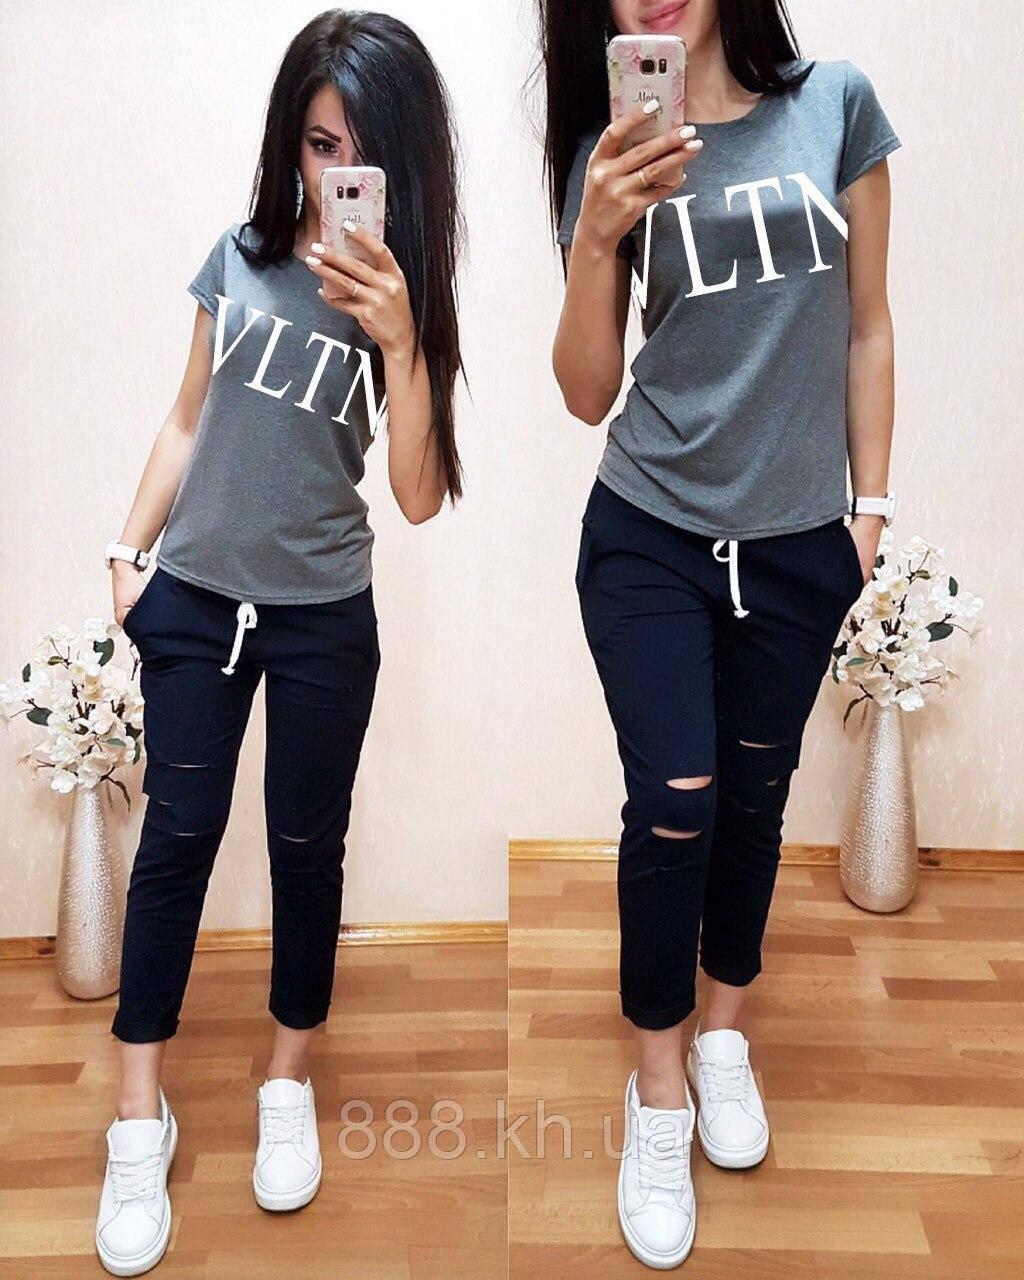 Нежная легкая женская футболка Valentino S/M/L/XL